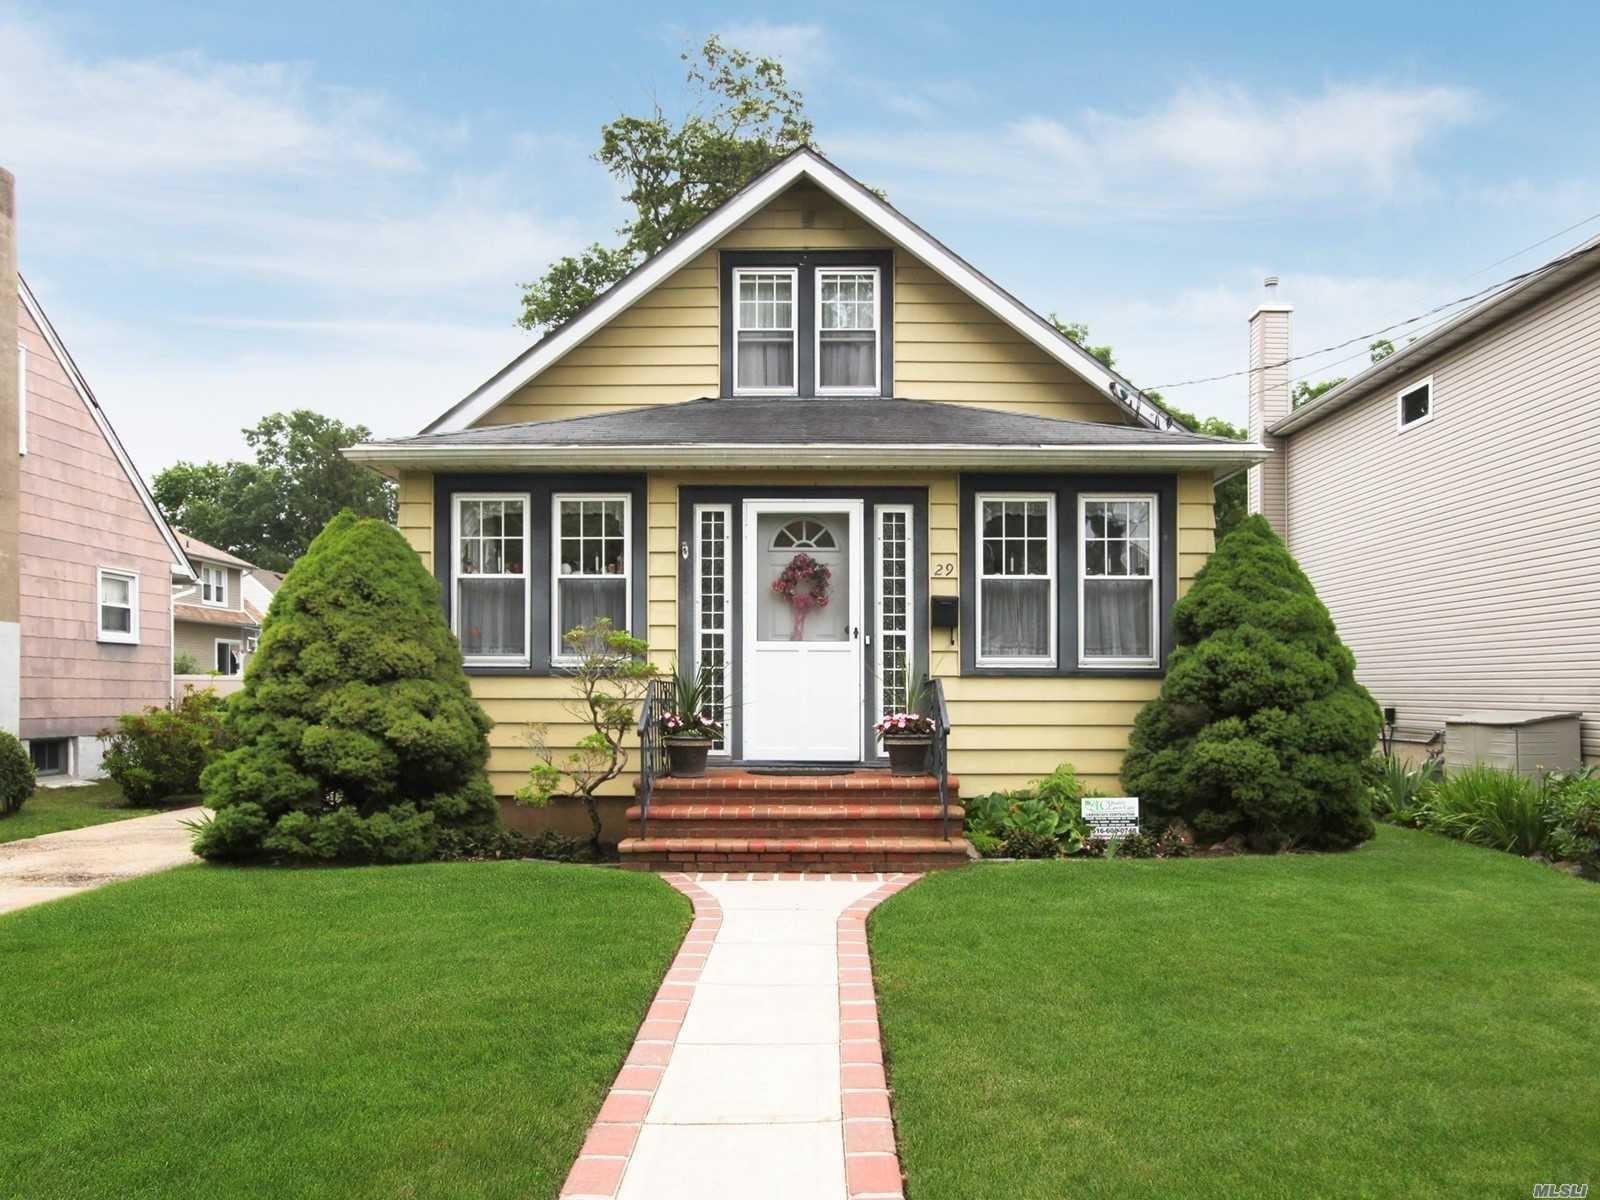 29 Princeton Place, Merrick, NY 11566 - MLS#: 3228629